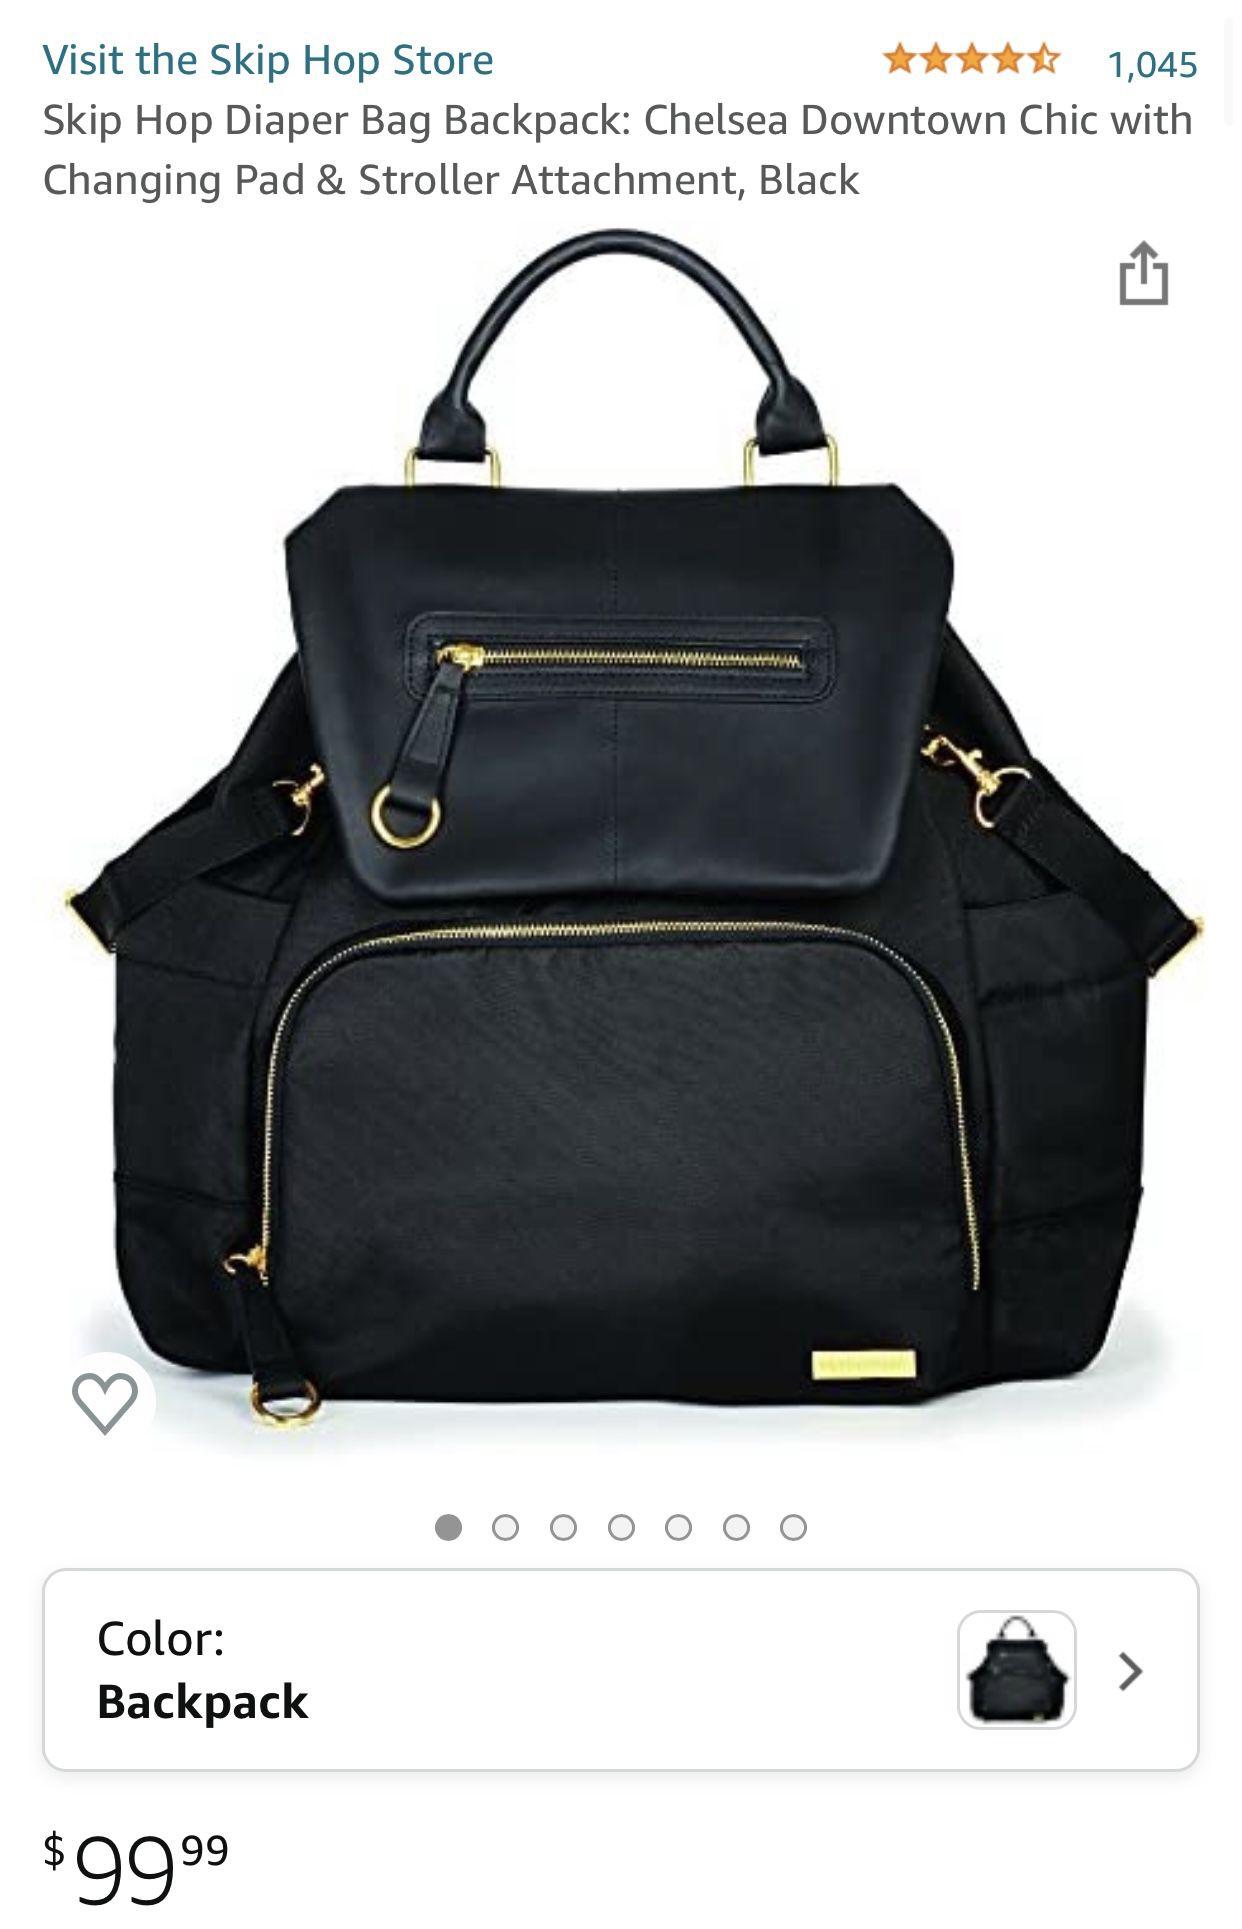 SKIP HOP Chelsea diaper backpack